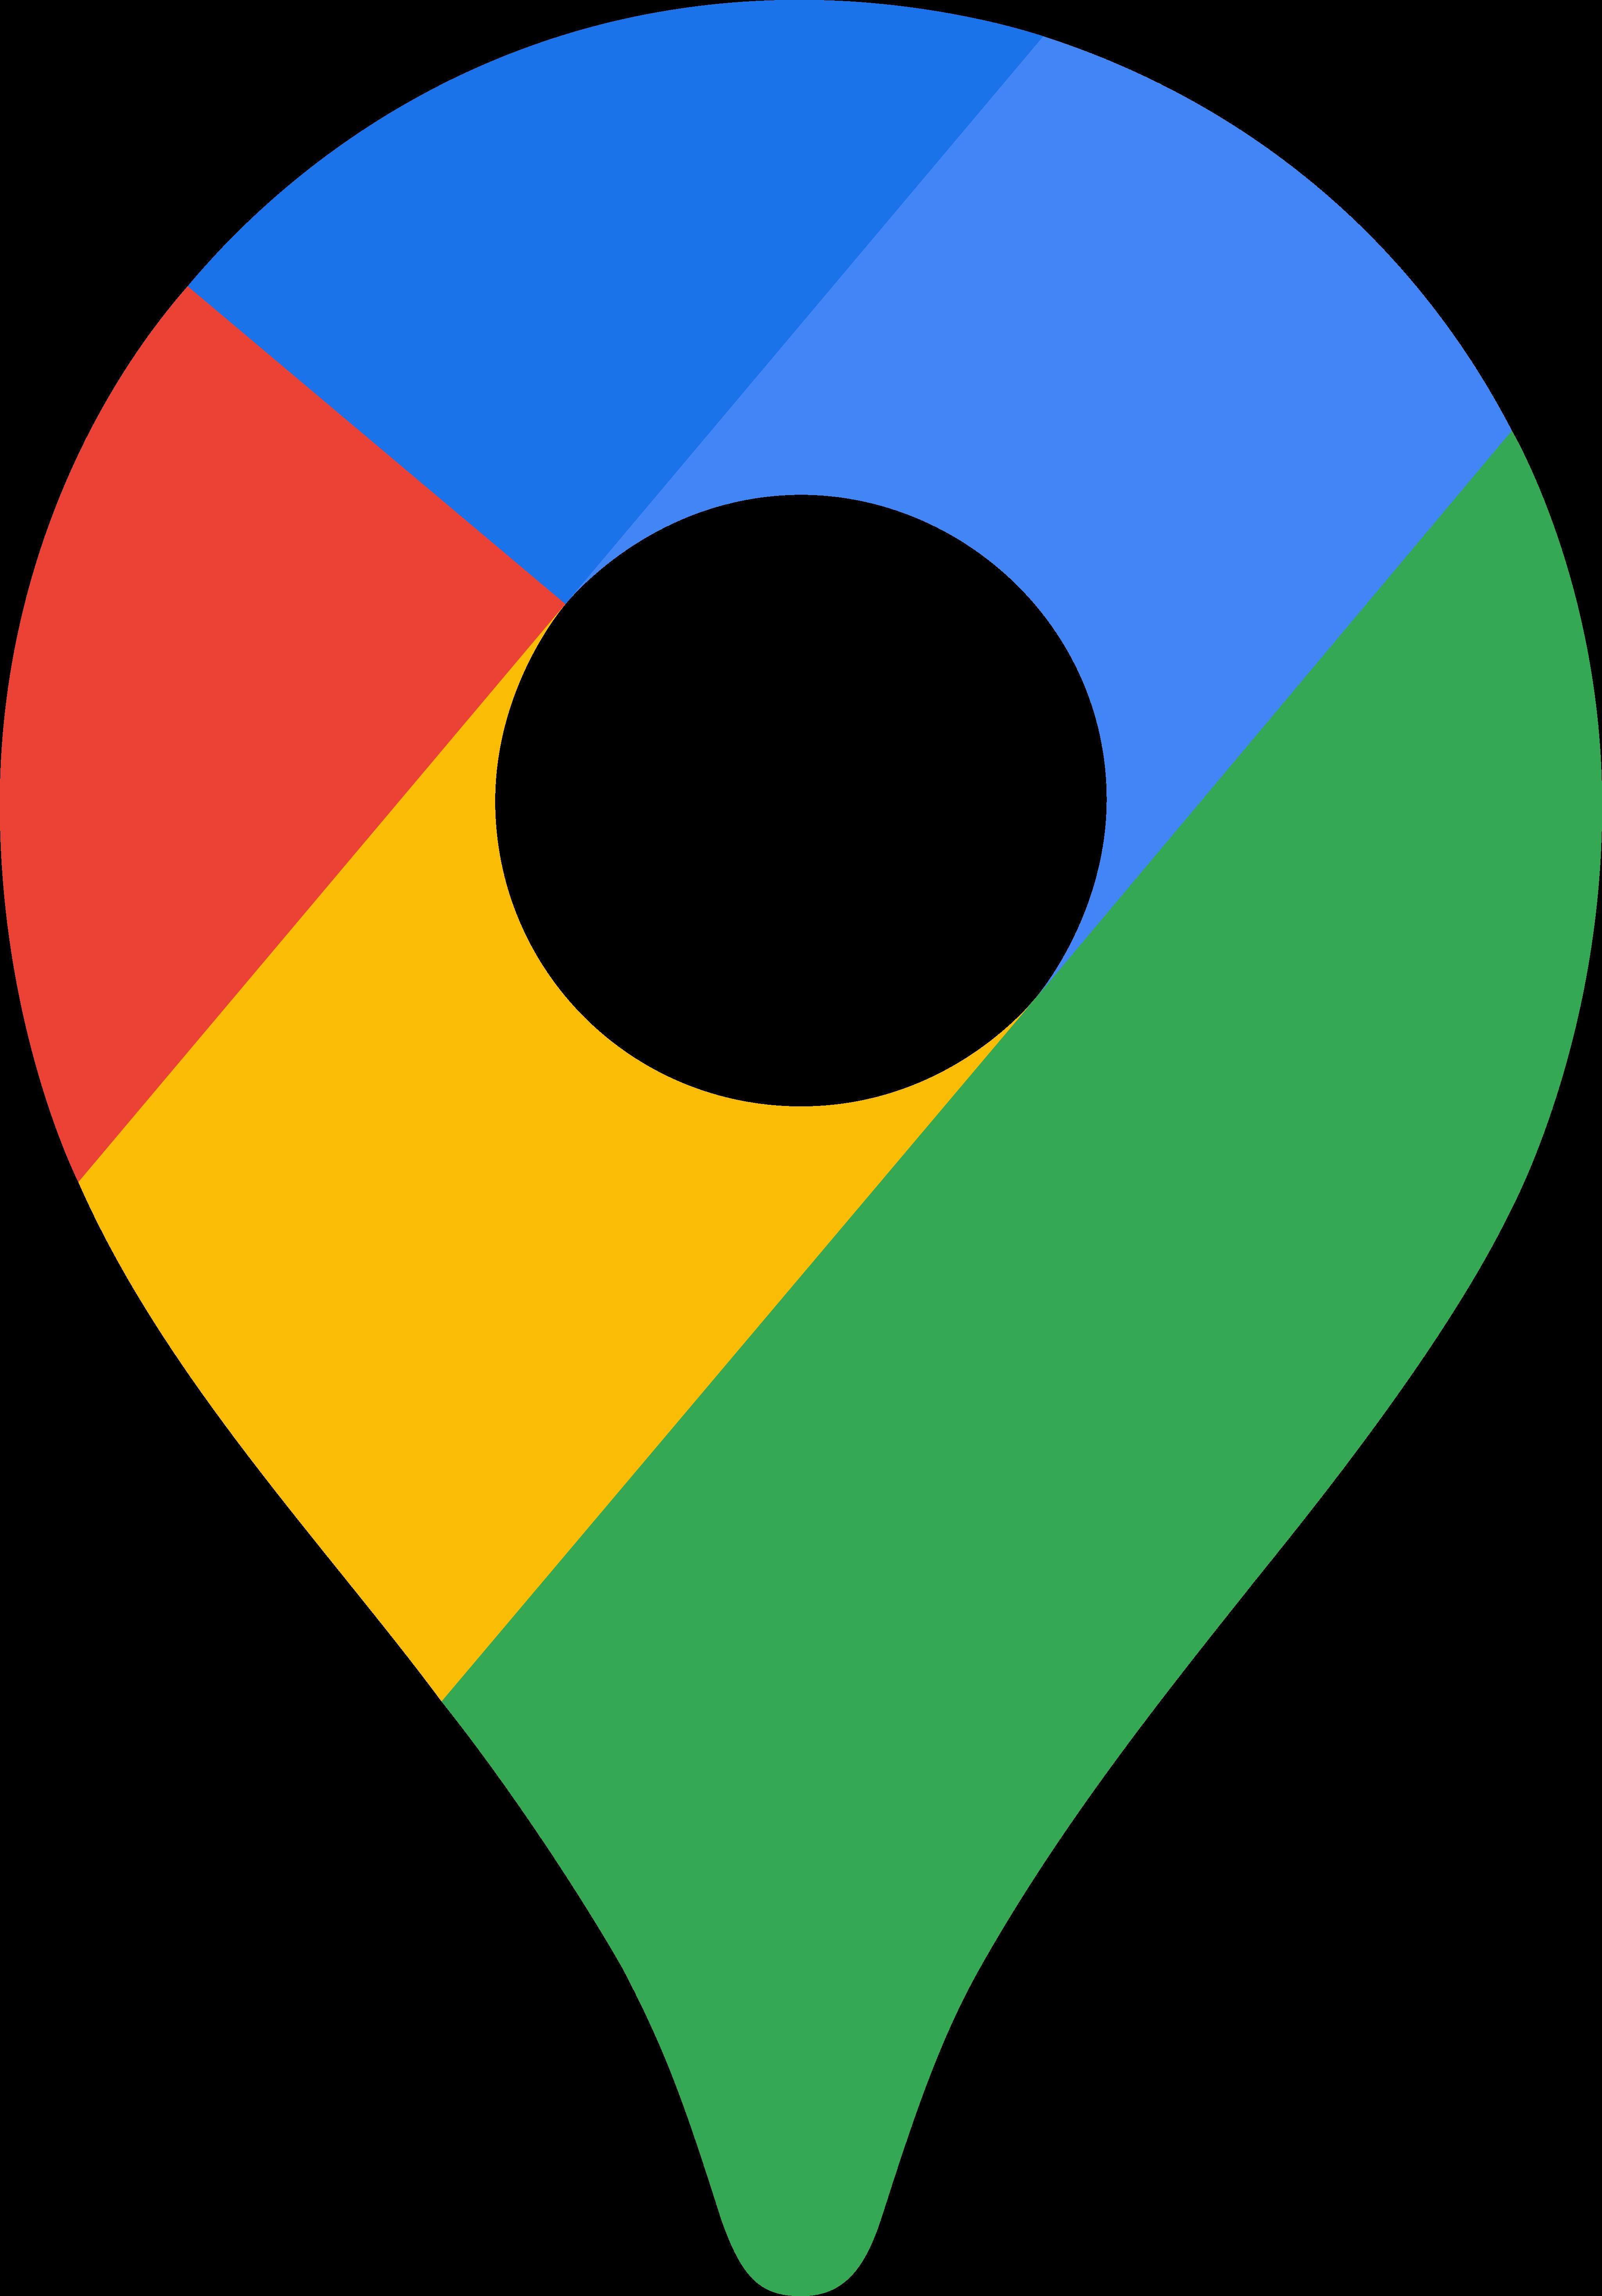 google maps logo 1 1 - Google Maps Logo